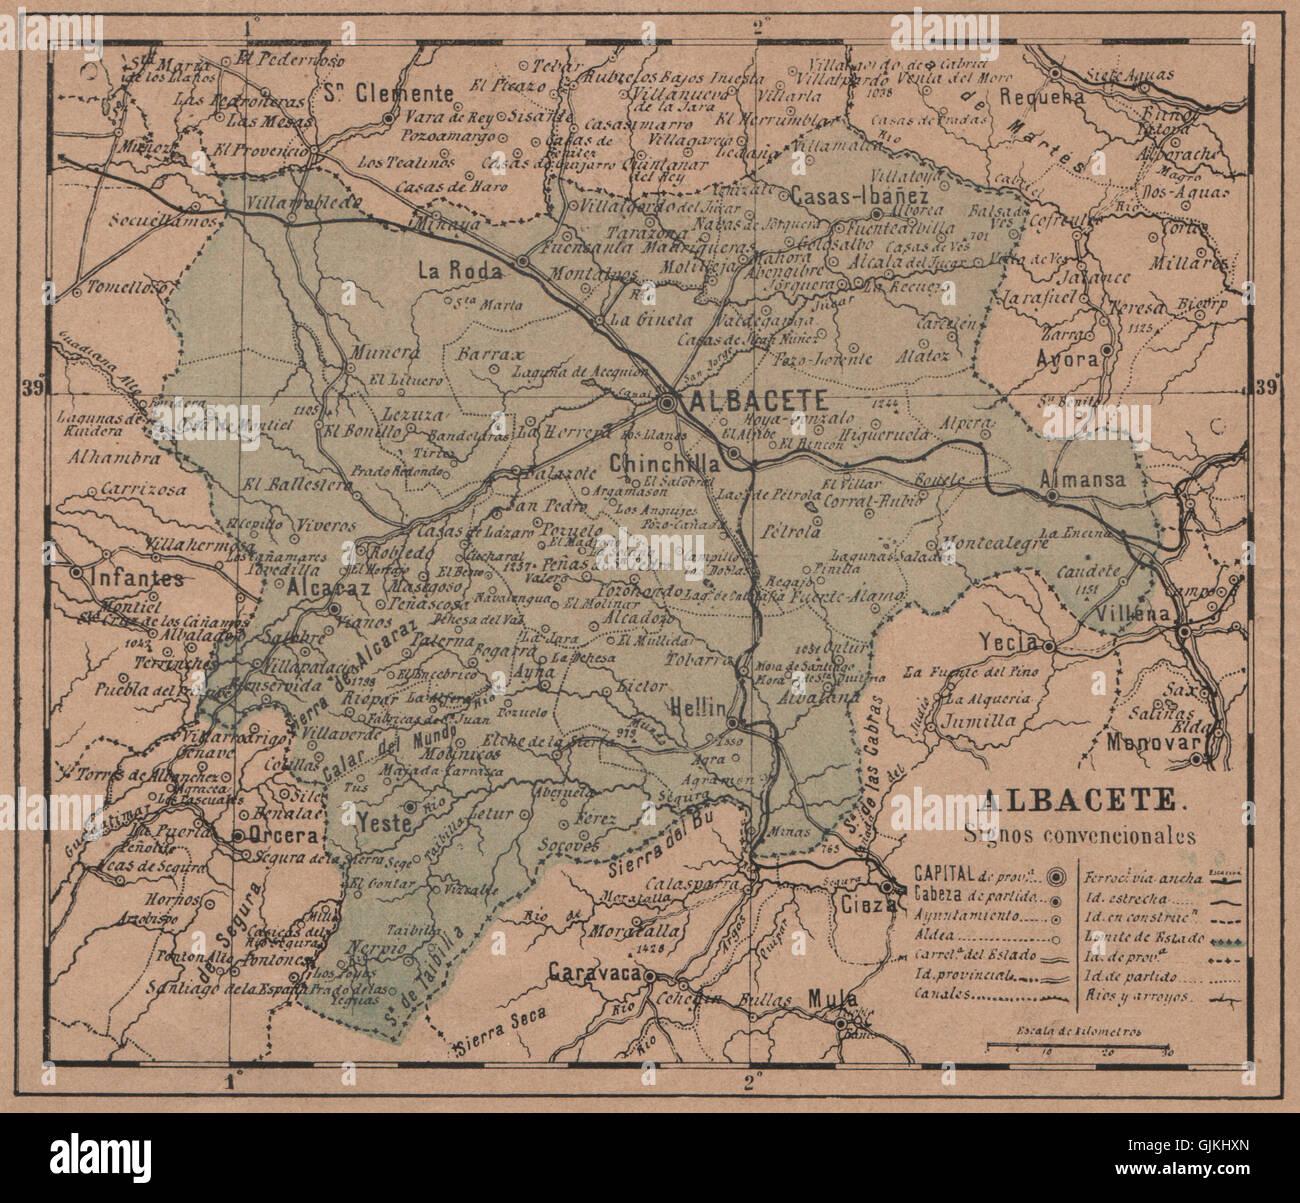 ALBACETE CastillaLa Mancha Mapa antiguo de la provincia 1908